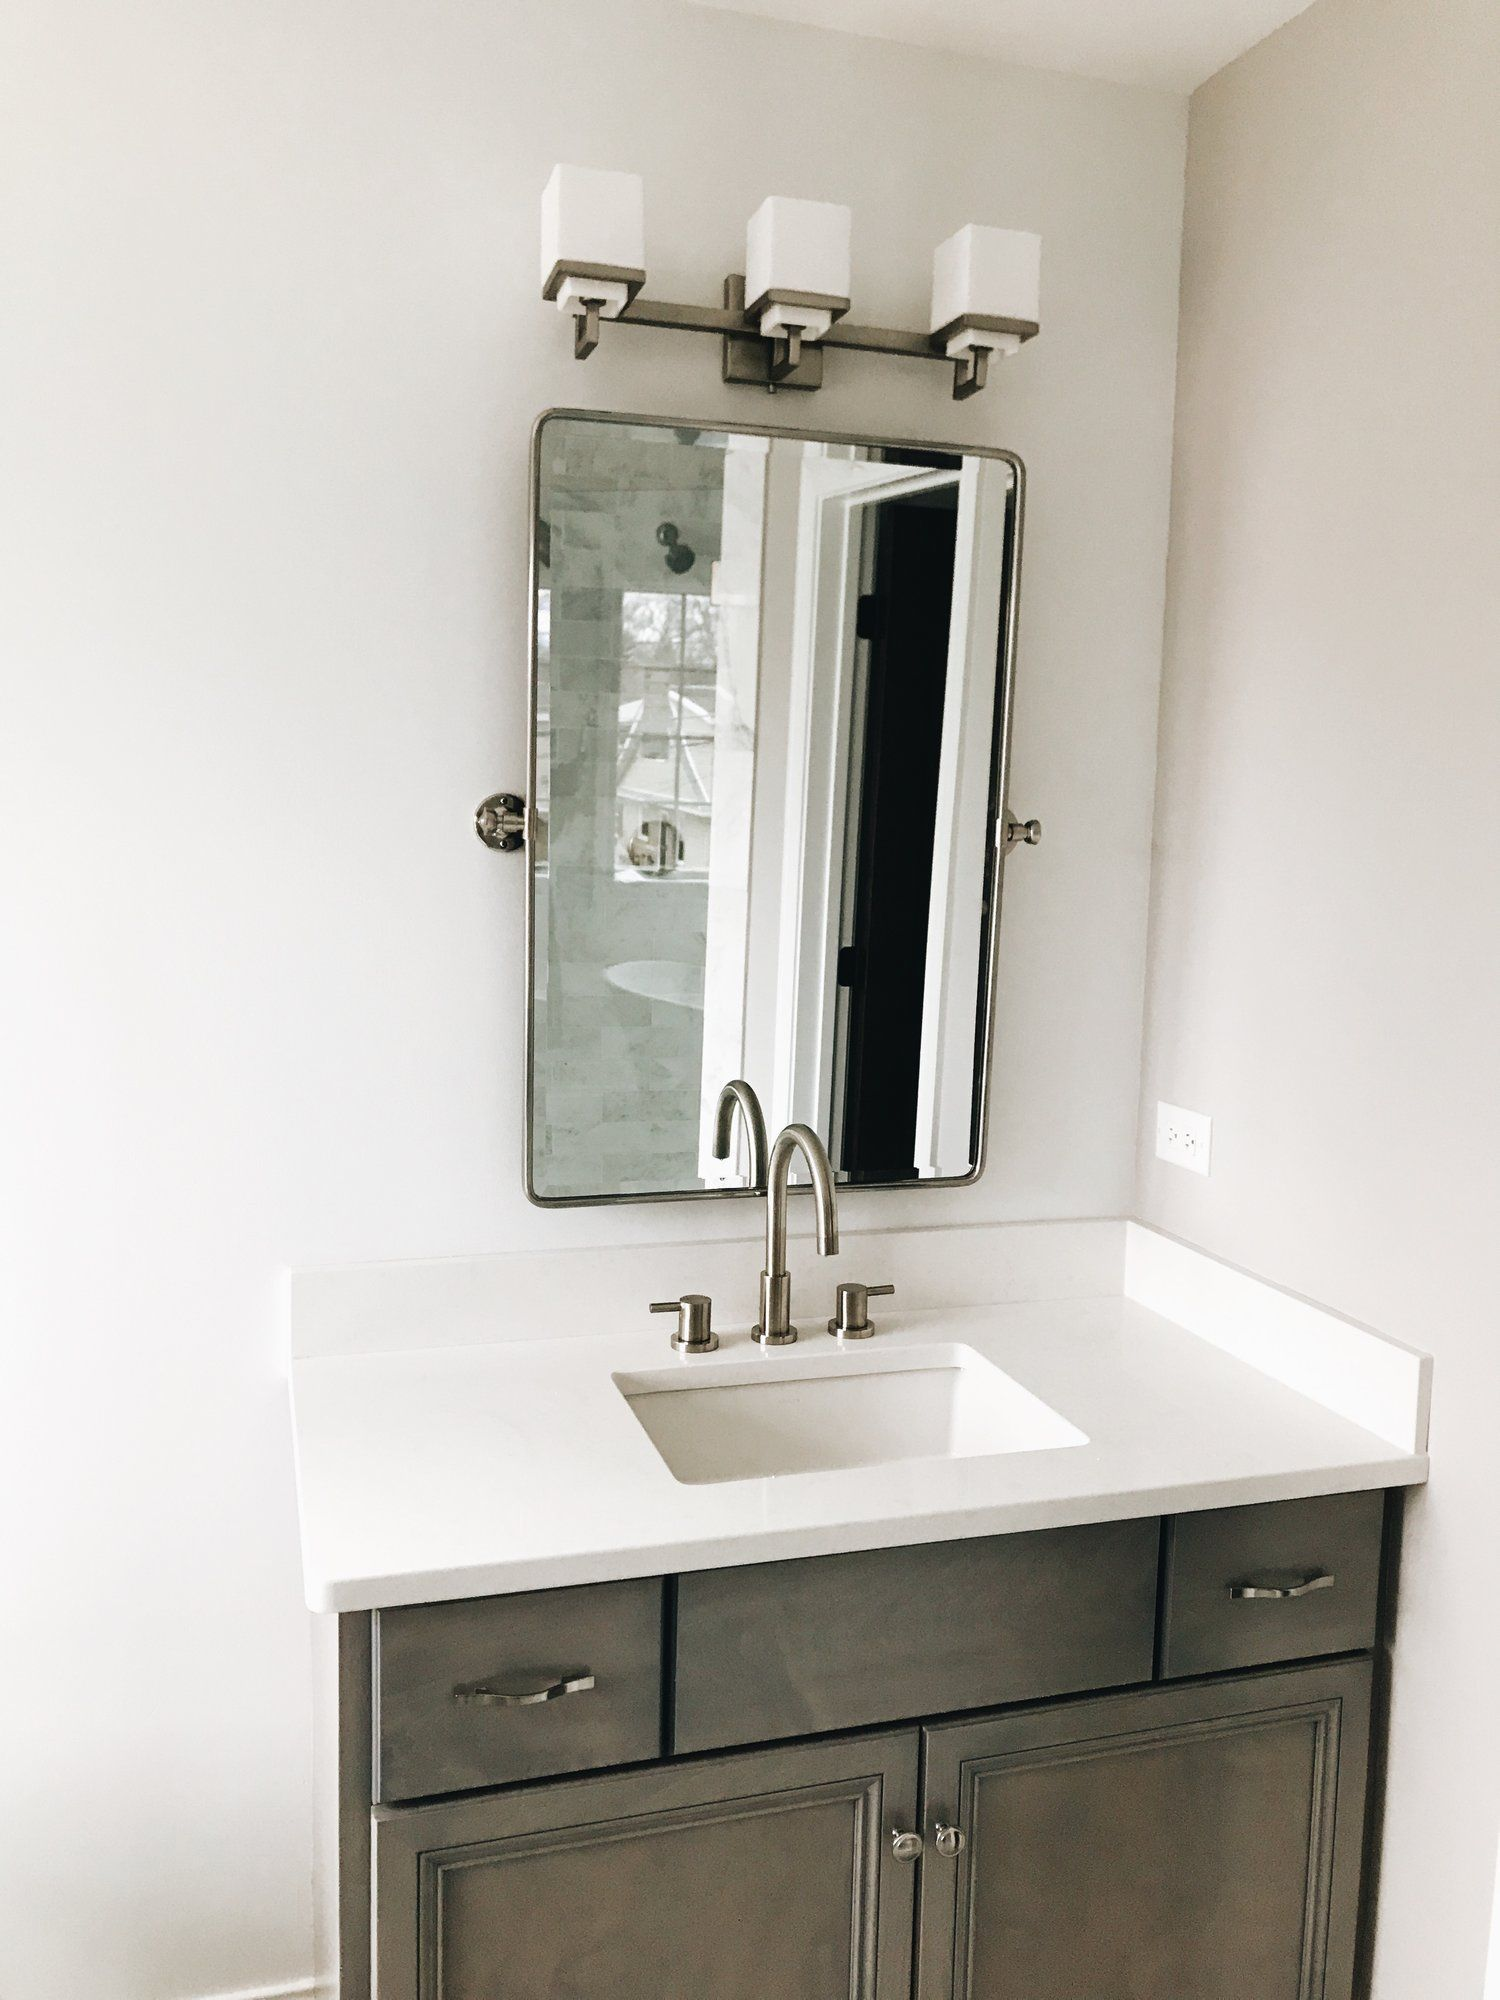 10 Budget Friendly Diy Vanity Mirror Ideas Vanity Mirror With Led Lights Bathroom Small Sim Bathroom Vanity Mirror Bathroom Vanity Bathroom Vanity Lighting